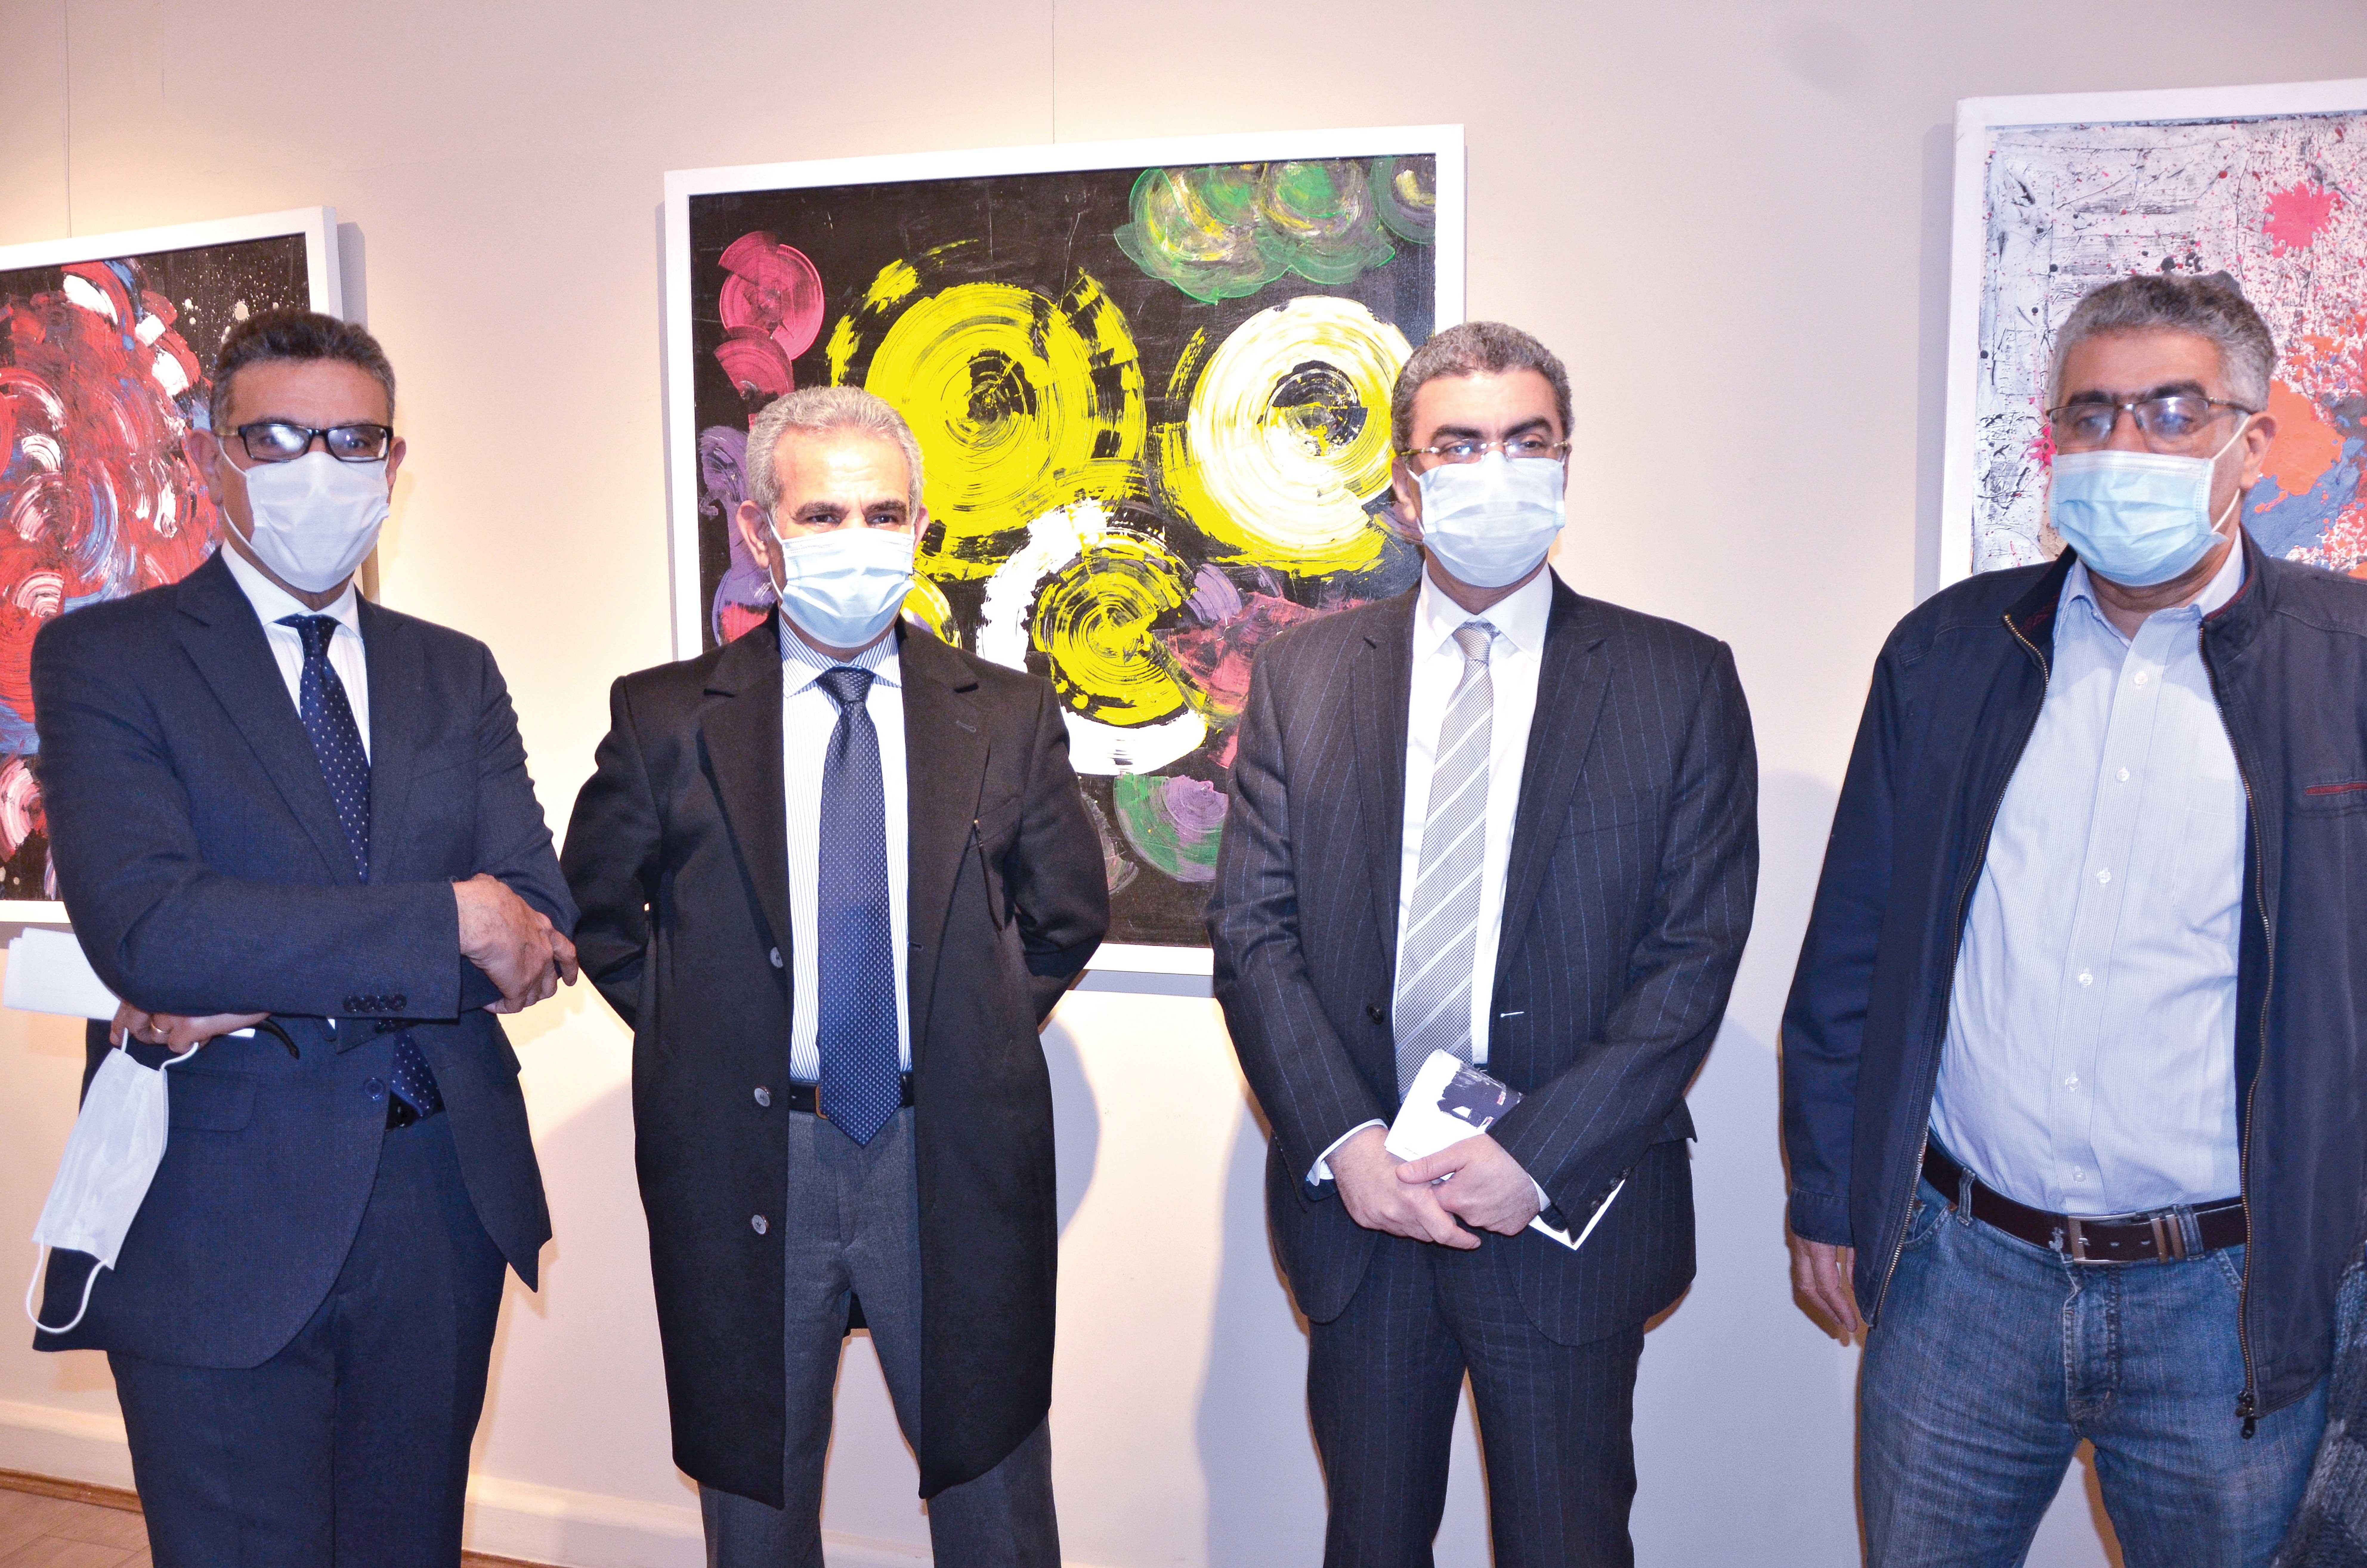 Mr. Gamal Fahmy, Mr. Ibrahim Picassio, Mr. Yasser Rizk & Mr. Emad Huessein